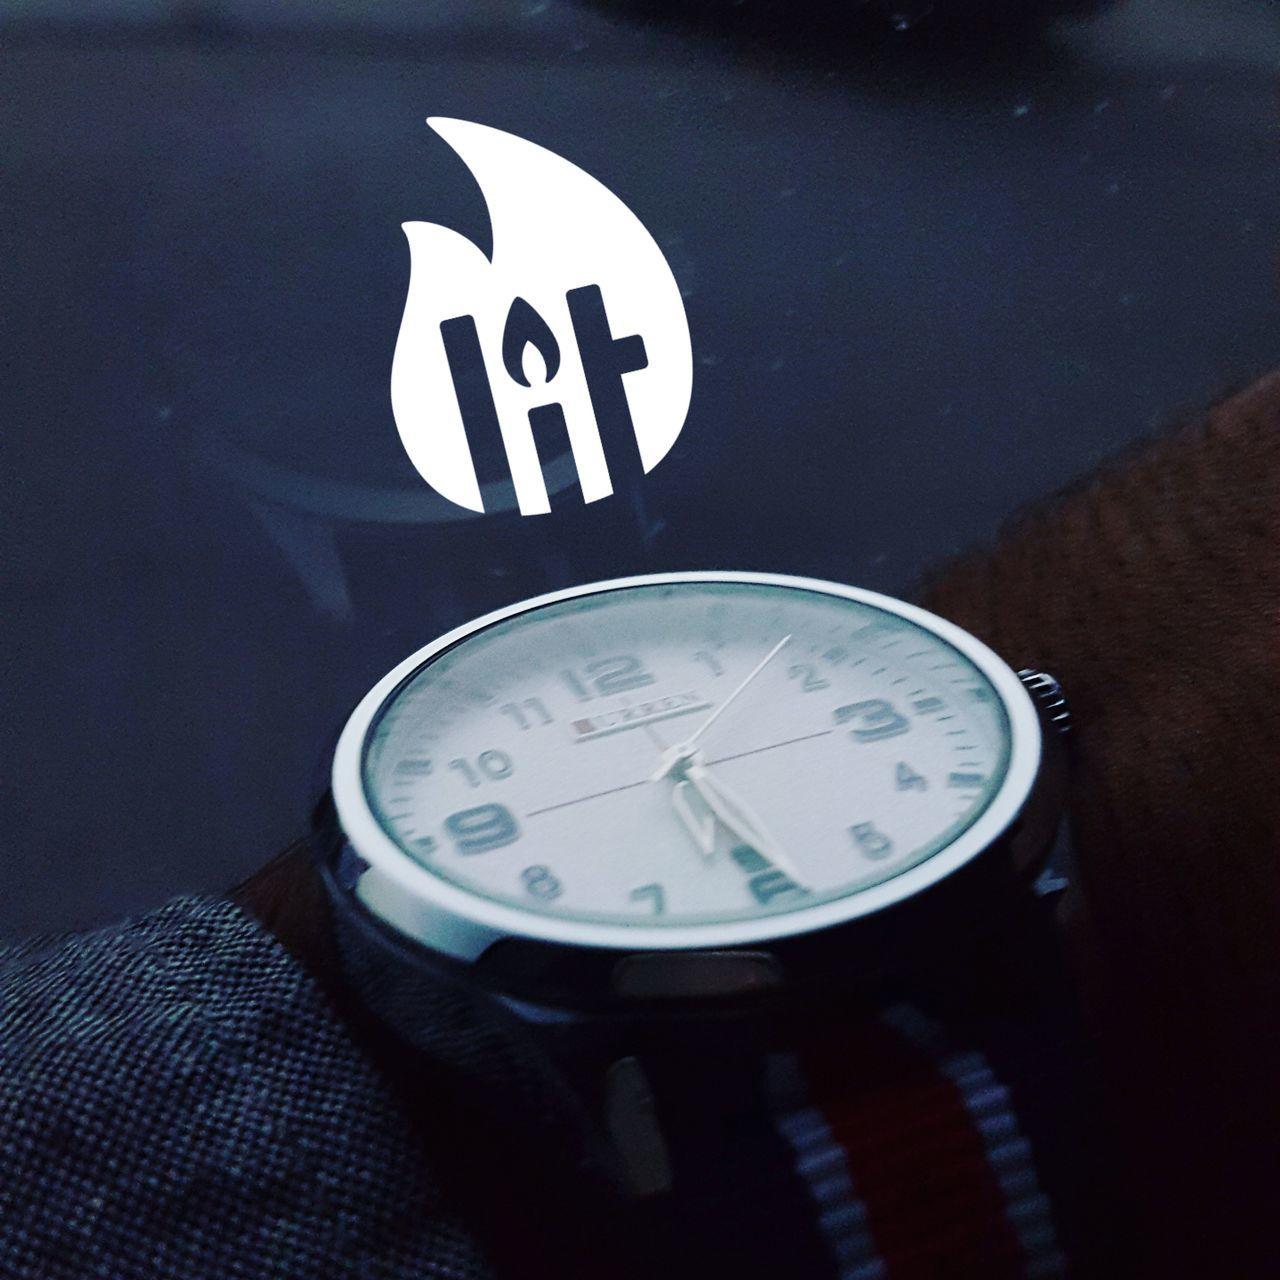 Clock Face Clock Watches Men GROWNMANSWAG s GrownMan Future Minimalism Minimalist h Hot DXB Abudhabi Bahrain Bahrain